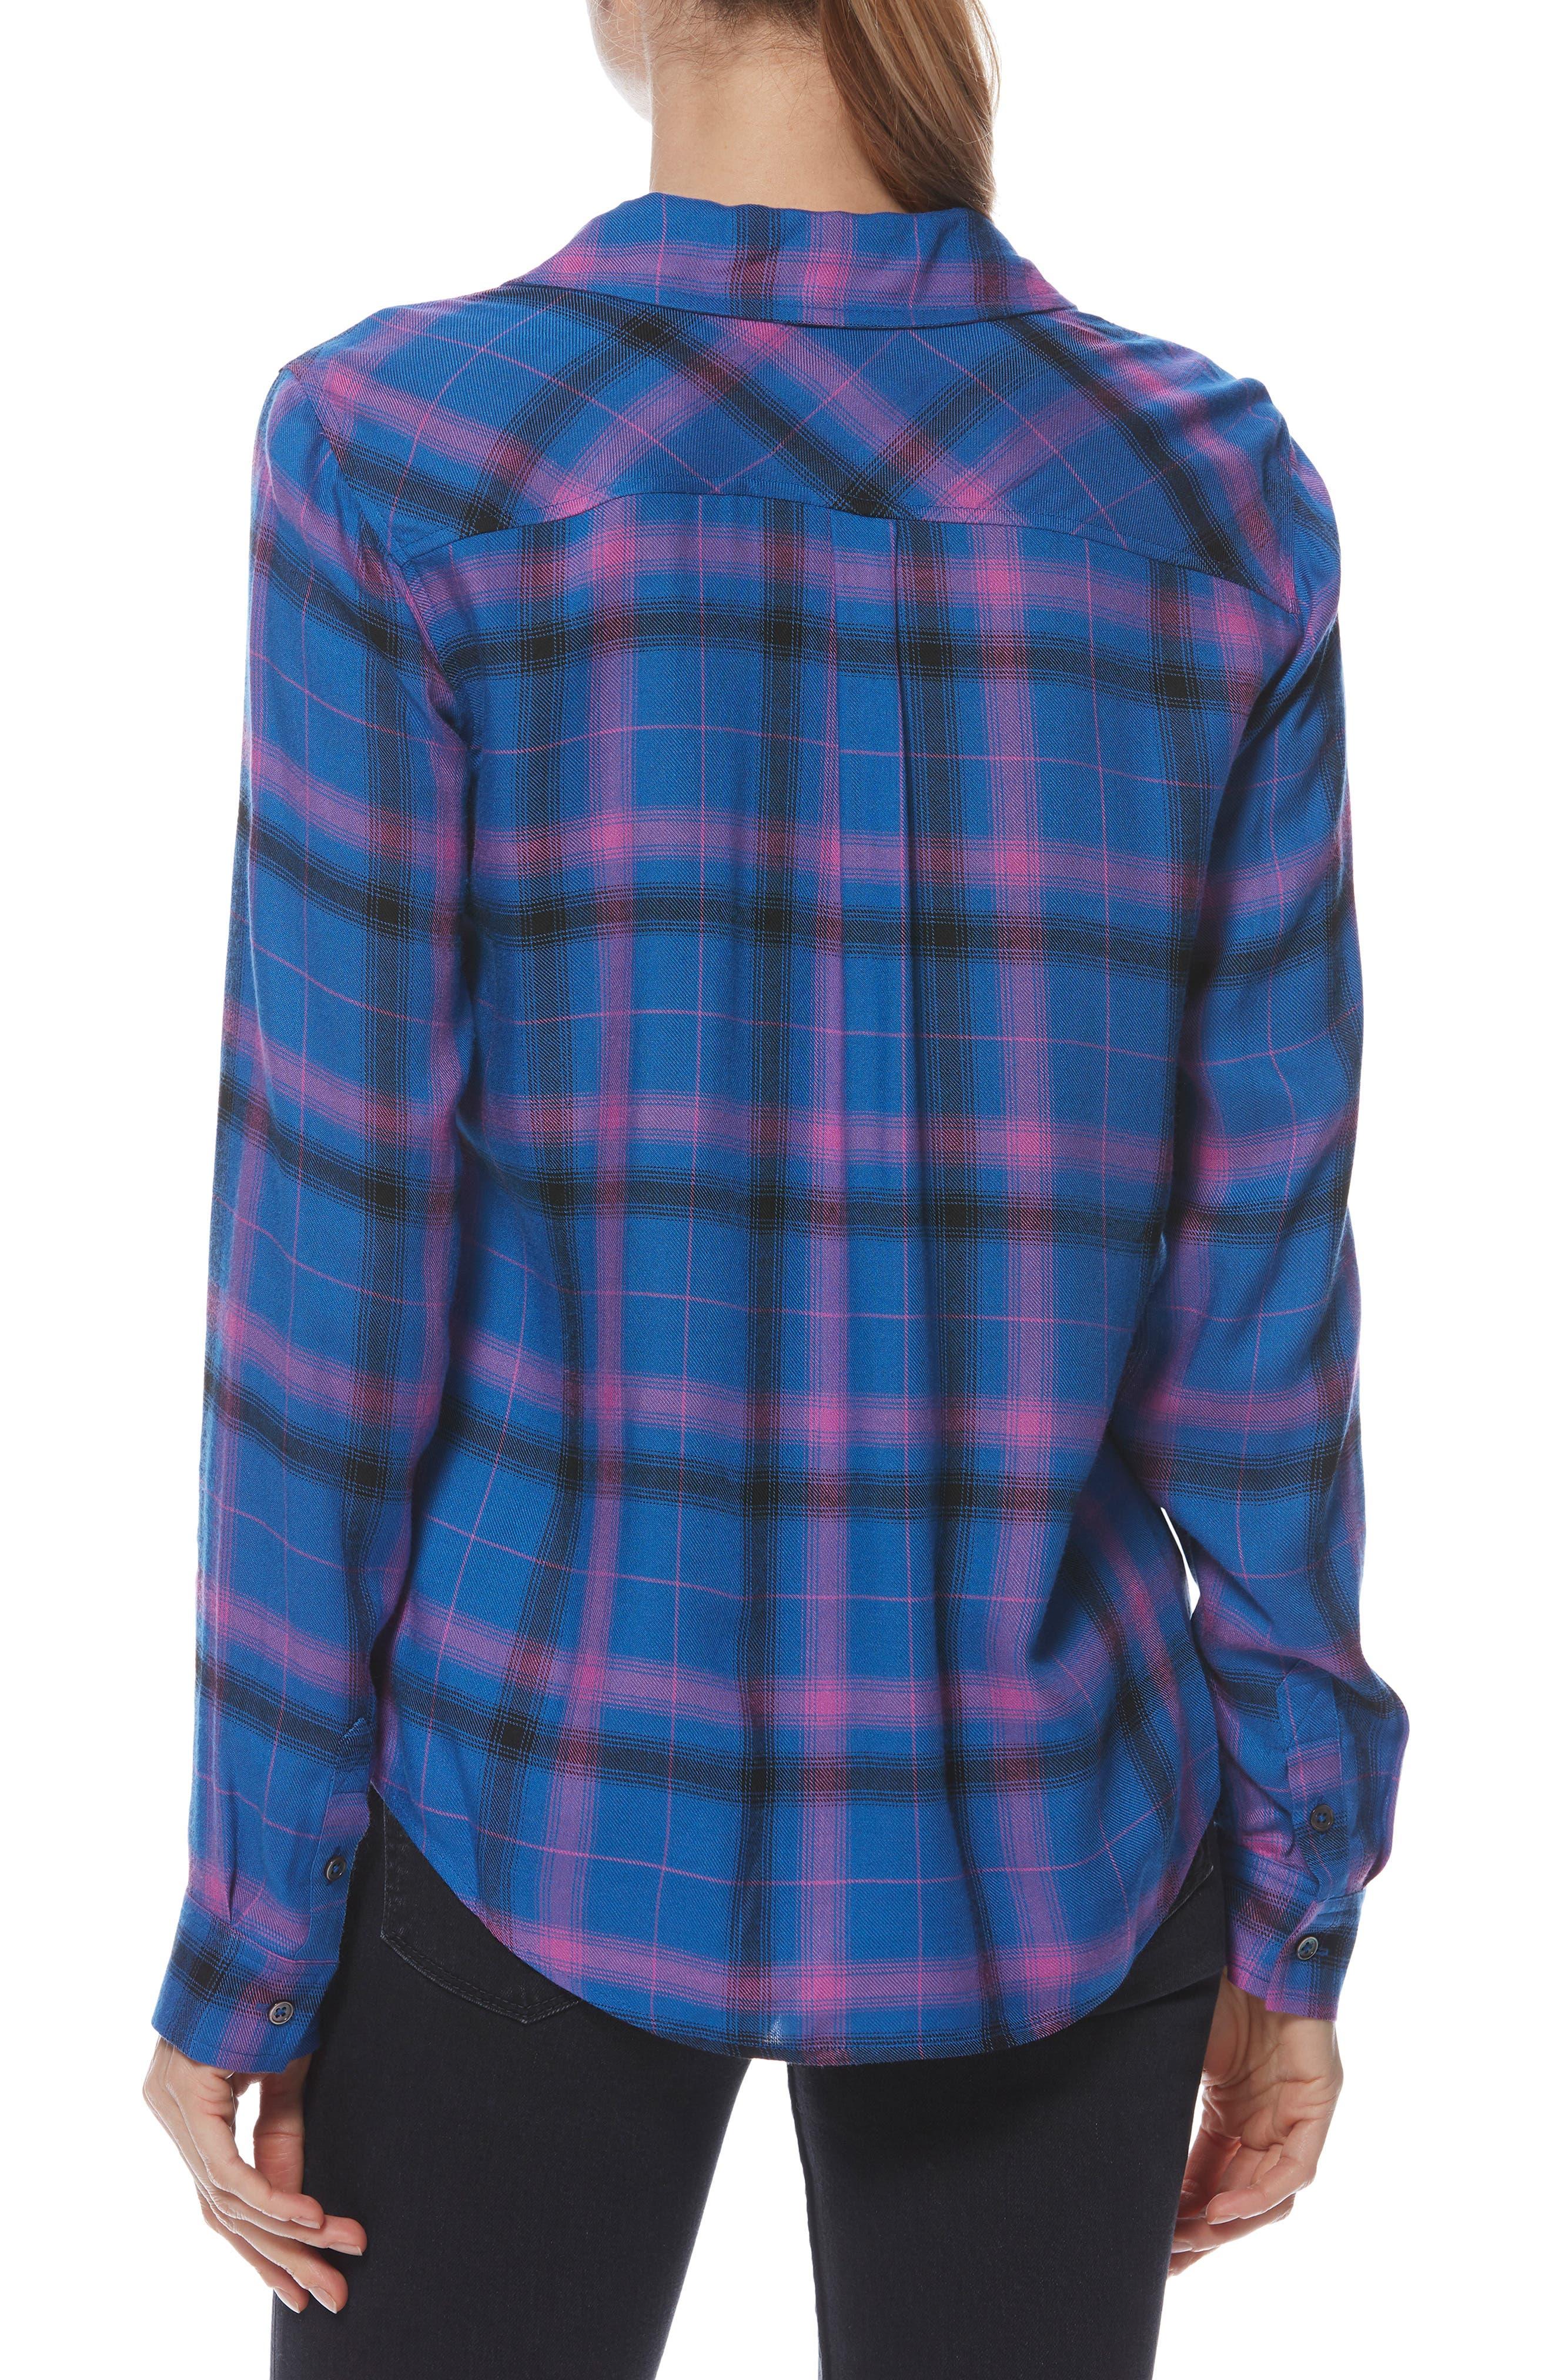 Mya Plaid Shirt,                             Alternate thumbnail 2, color,                             BRIGHT CROWN BLUE MULTI